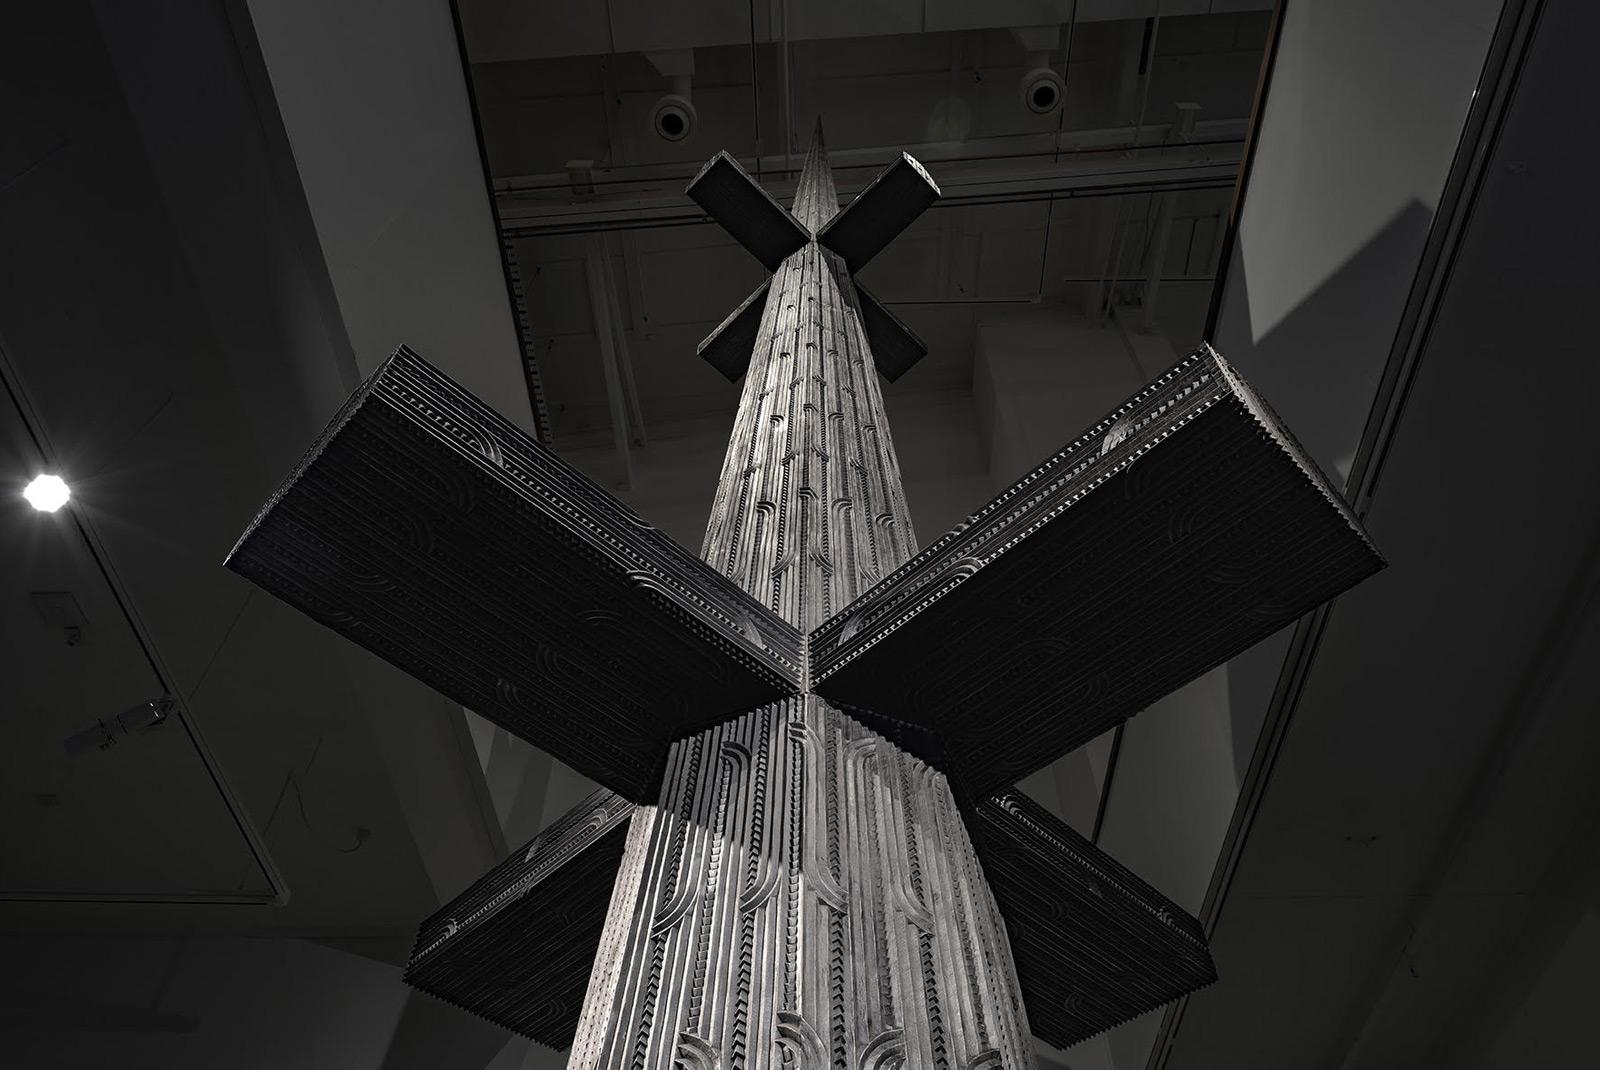 Cease Tide of Wrong-Doing (Tai Moana Tai Tangata), sculpture by New Zealand artist Brett Graham